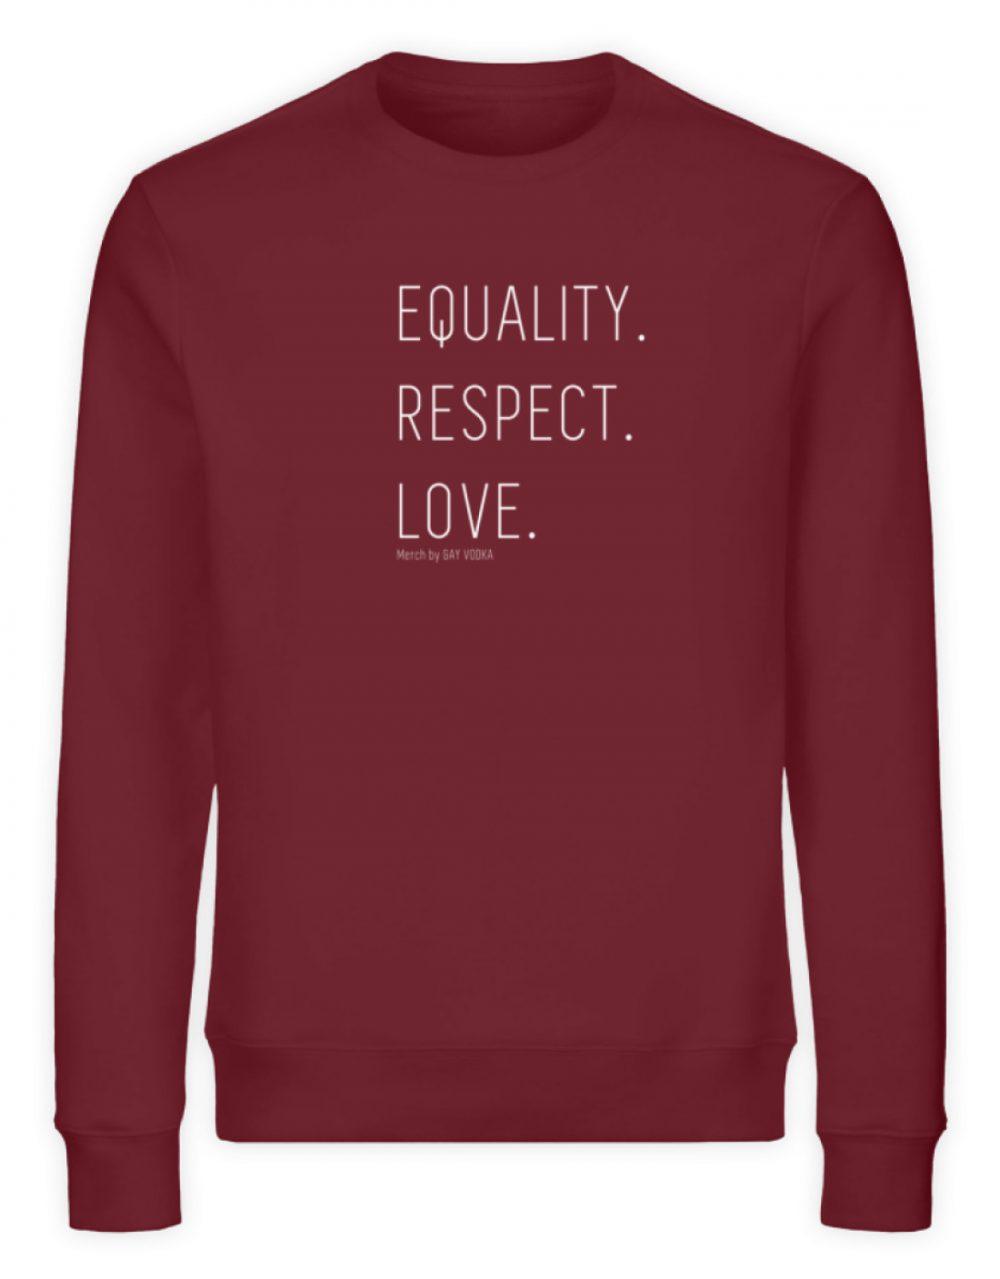 EQUALITY. RESPECT. LOVE. - Unisex Organic Sweatshirt-6883